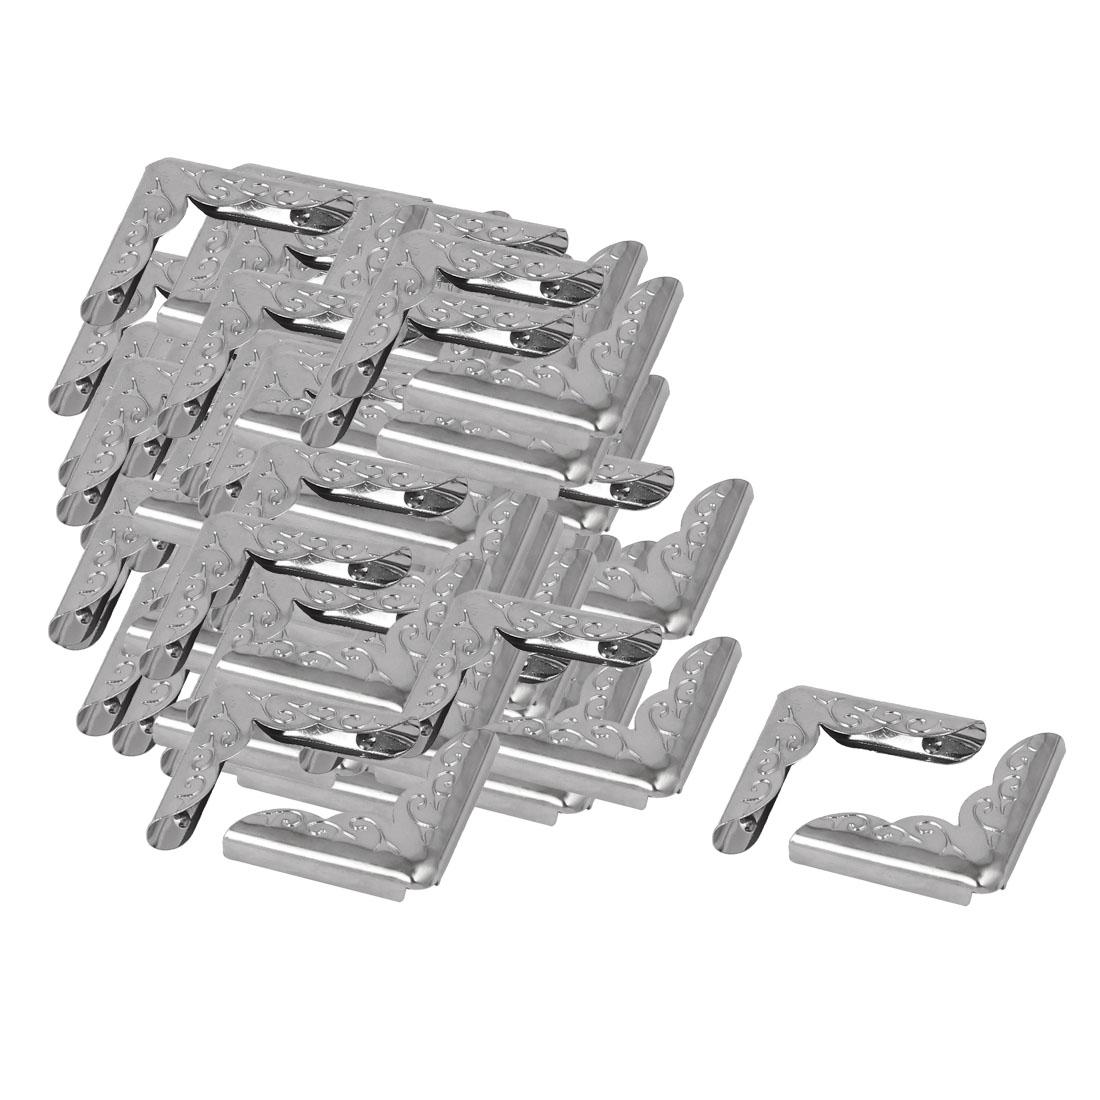 Jewelry Case Box Book Iron Corner Protector Silver Tone 22mmx6mm 100pcs